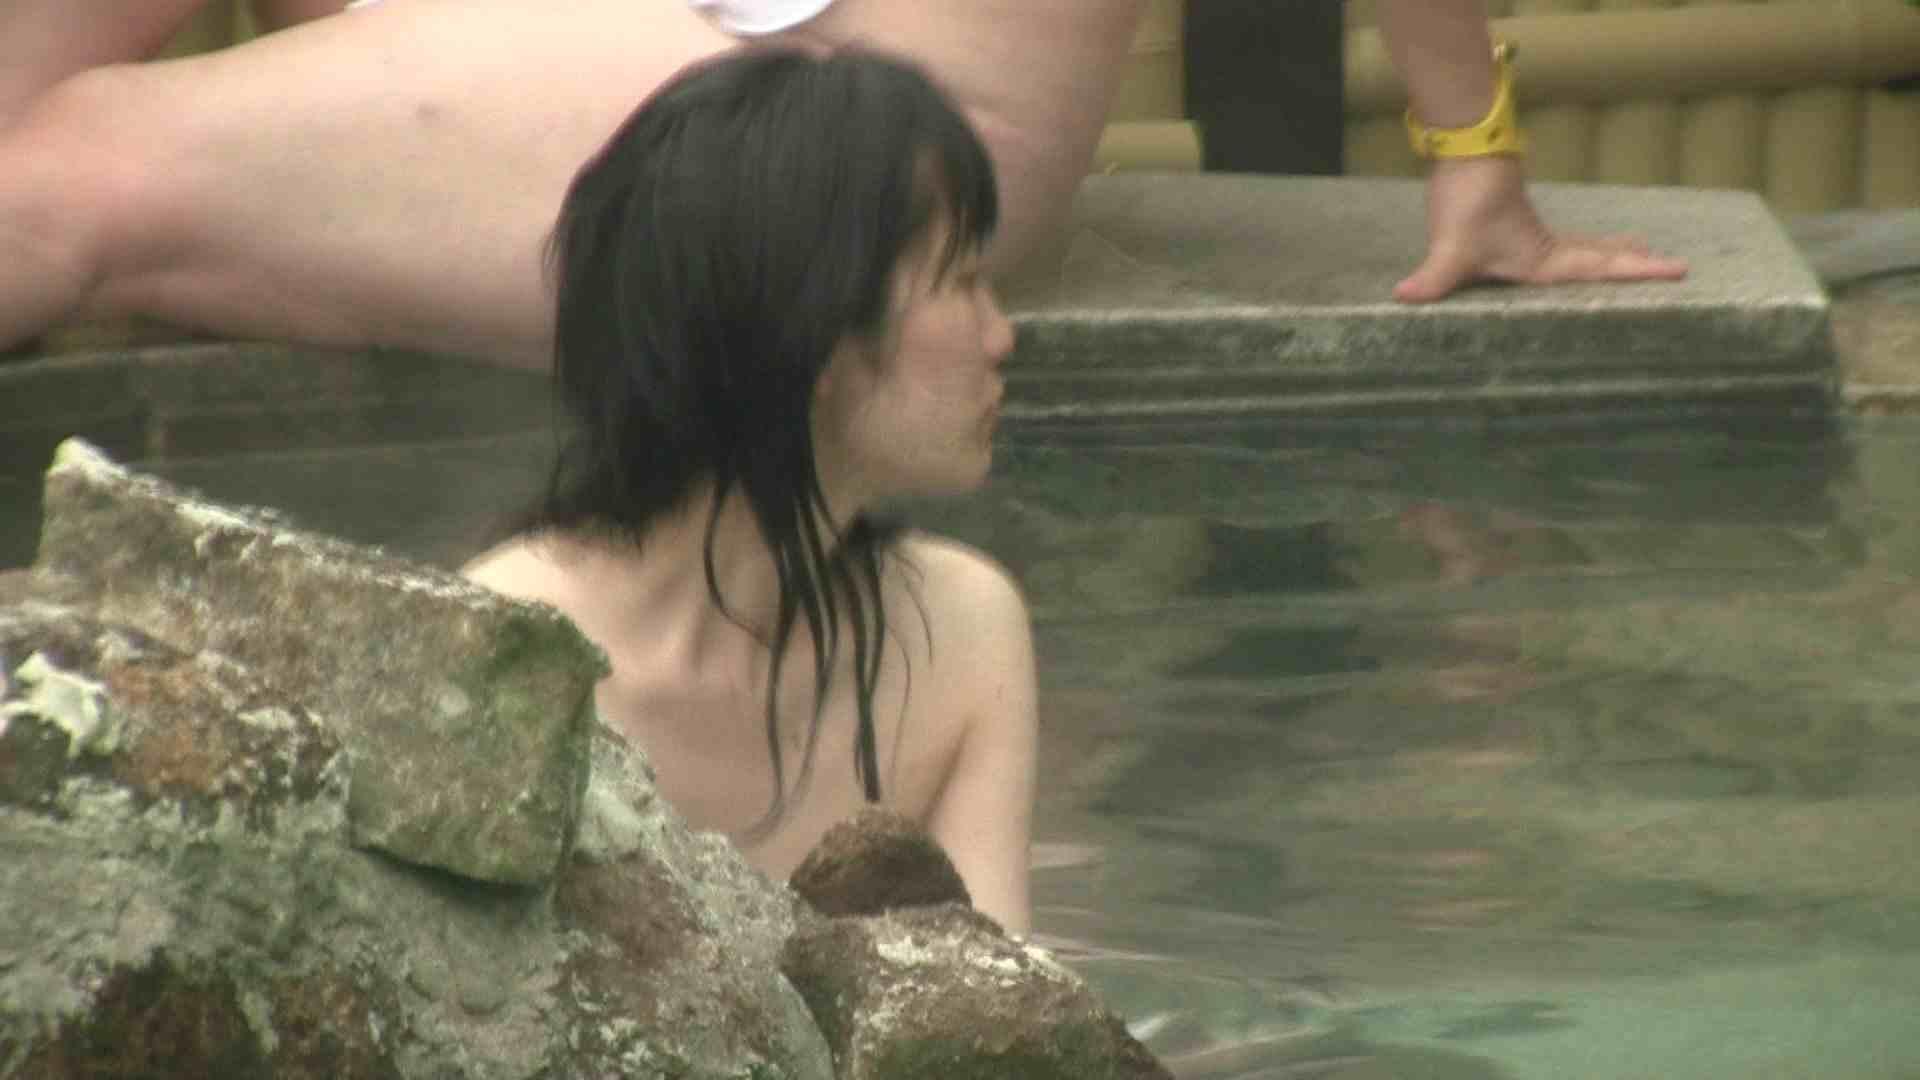 Aquaな露天風呂Vol.14【VIP】 盗撮シリーズ   露天風呂編  94PIX 81